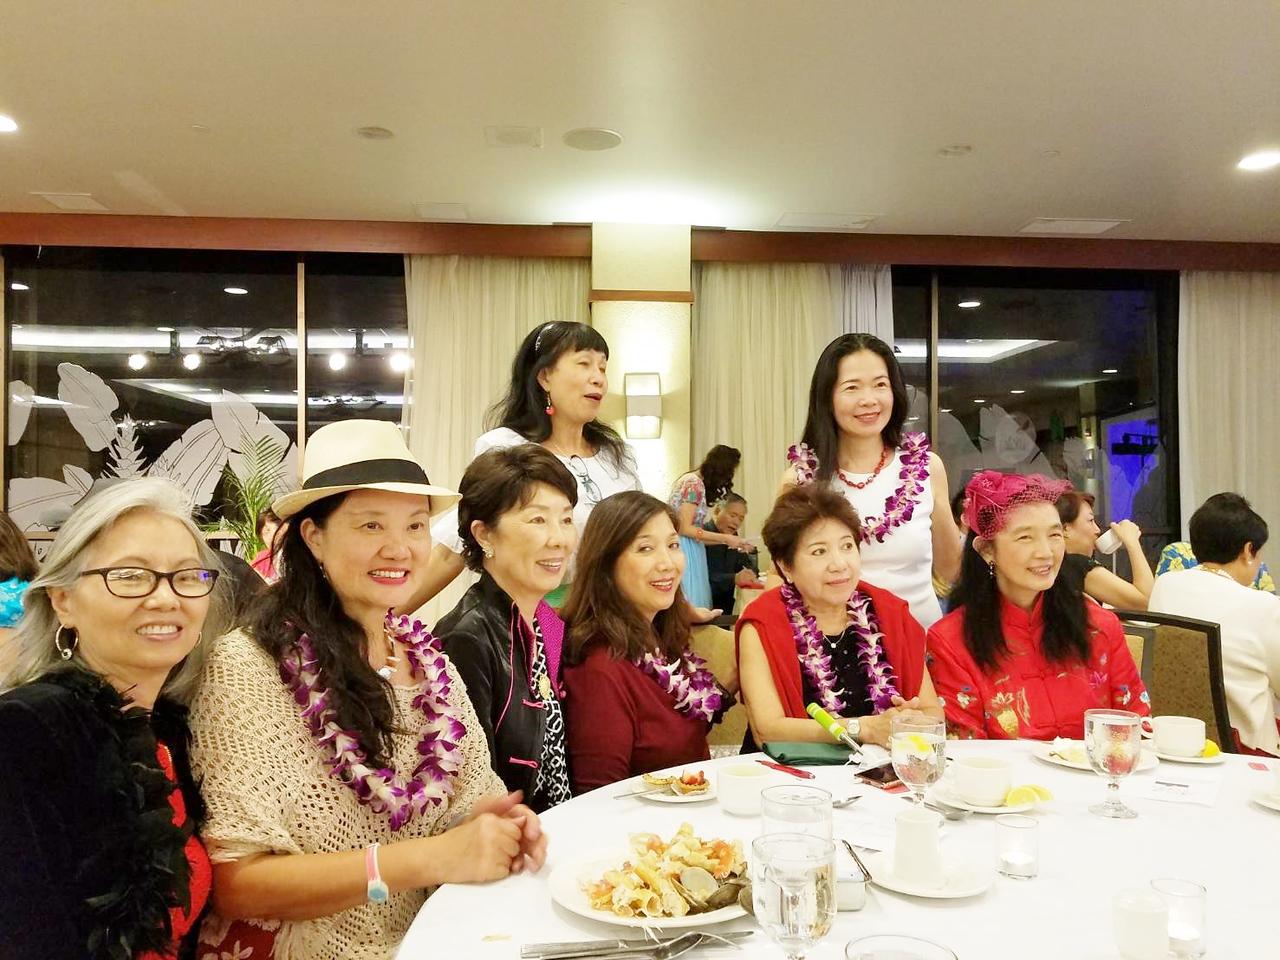 021718 at TAA dinner : Susan - MayLee  Jennie - Li May - Diana - Elizabeth - SJ & Amy